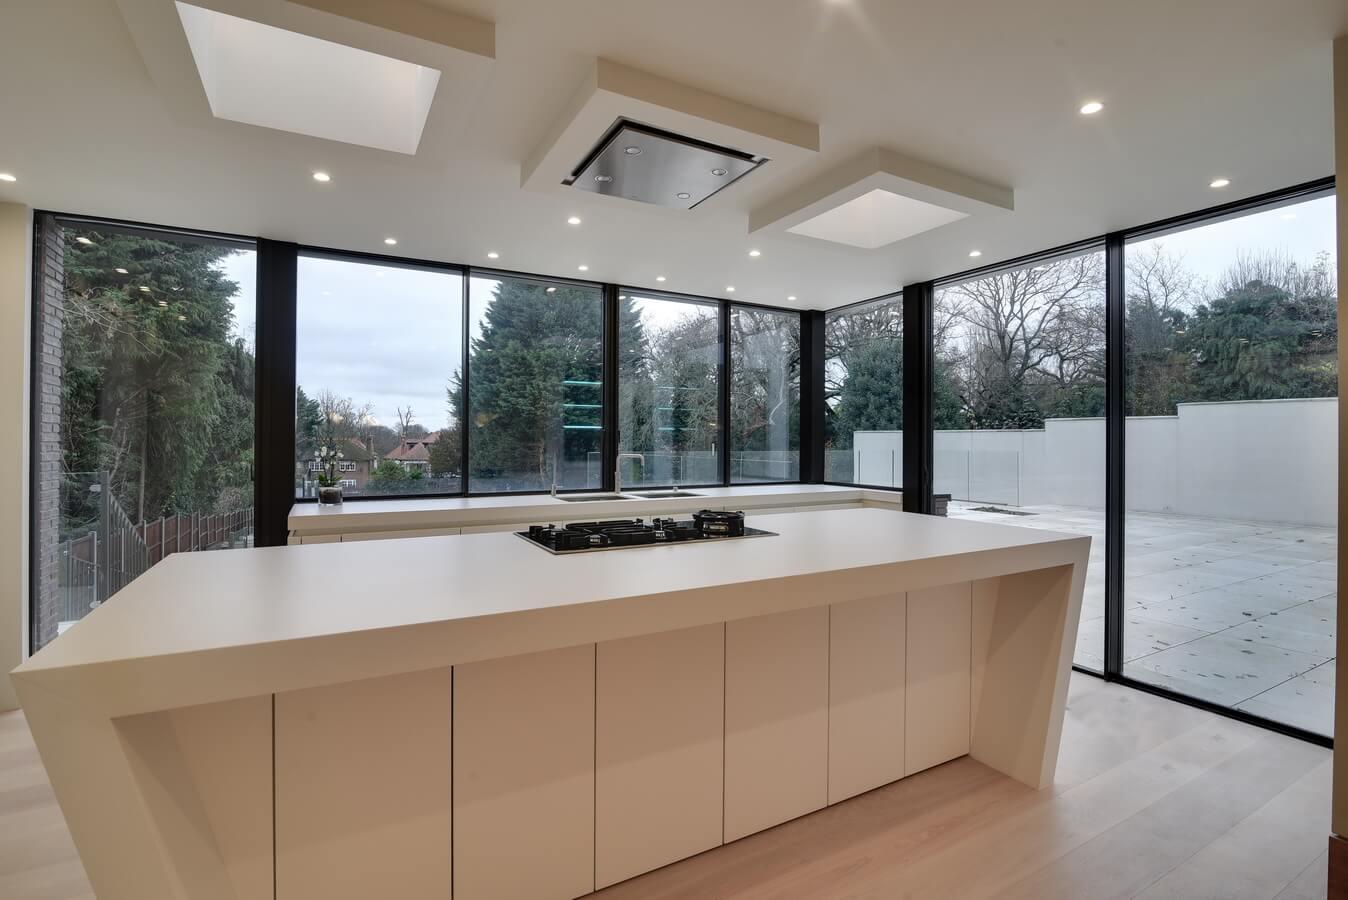 Next125-White-Satin-Lacquer-German-Kitchen-North-London.jpg